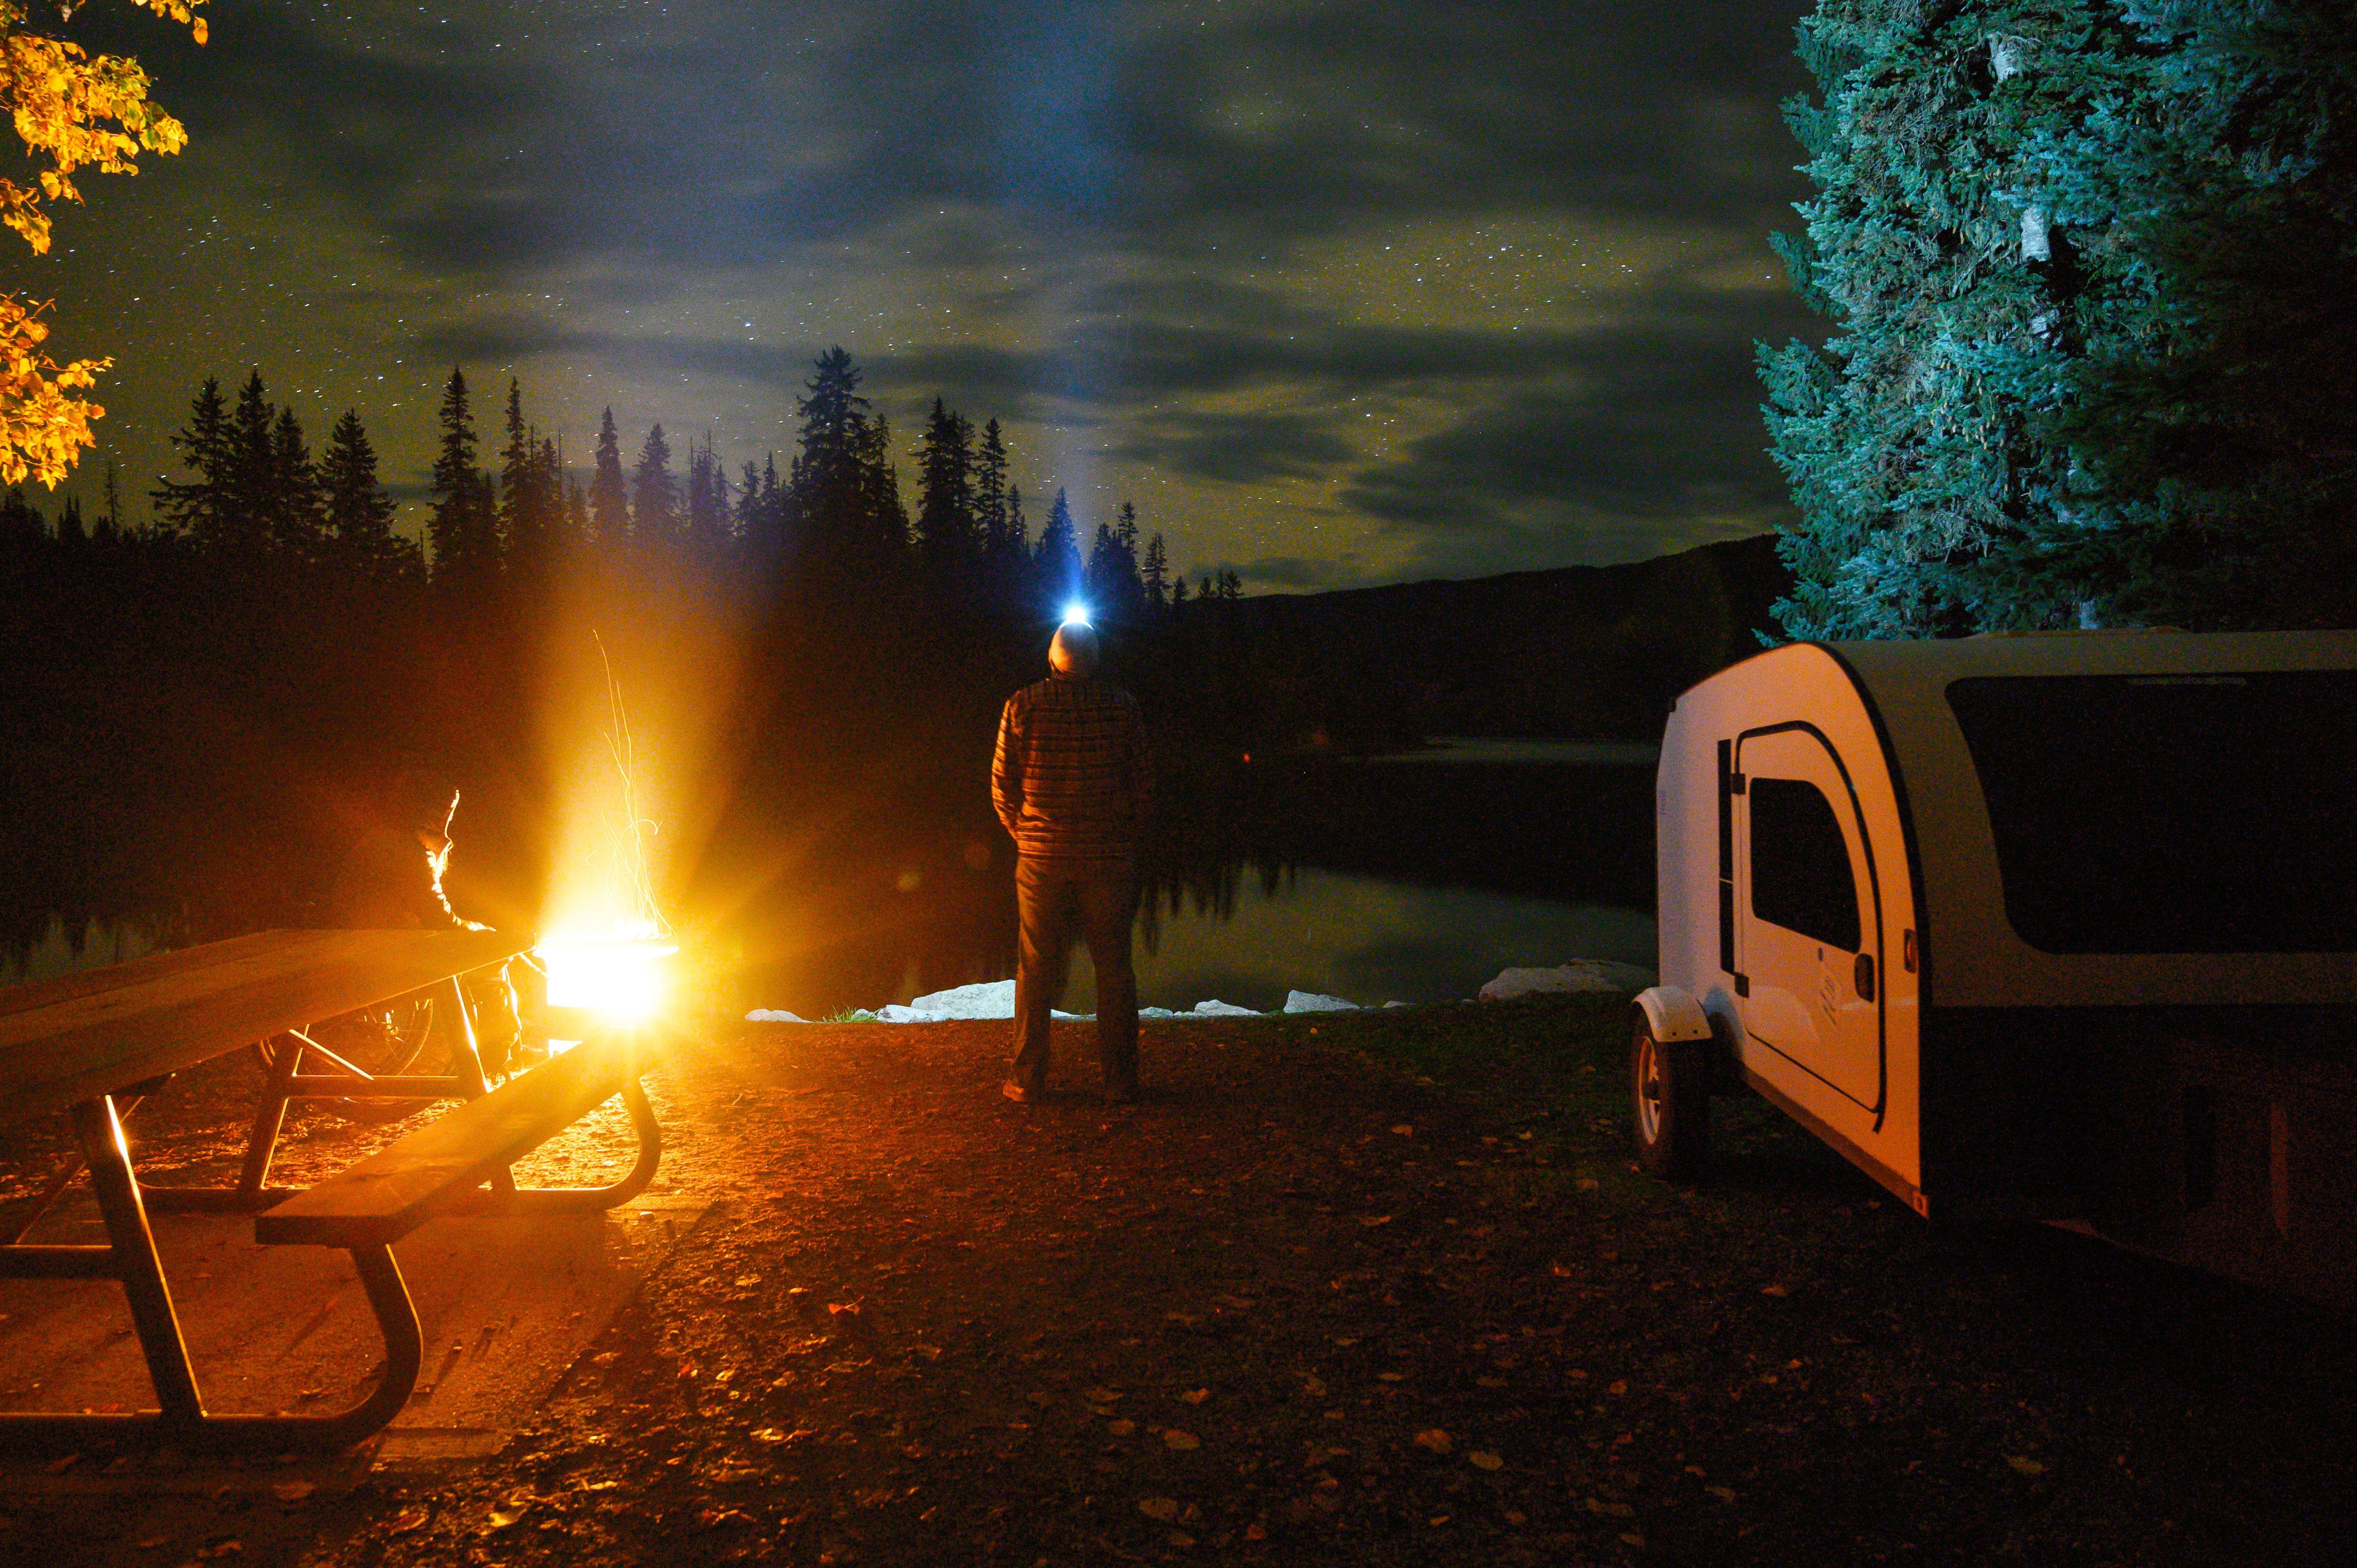 DROPLET - Get lost in the nature #getlost #getaway #weekendgetaway #nature #lovenature ##BringBackWildhood #exploring #camping #glamping #beautifulbritishcolumbia #explorebc